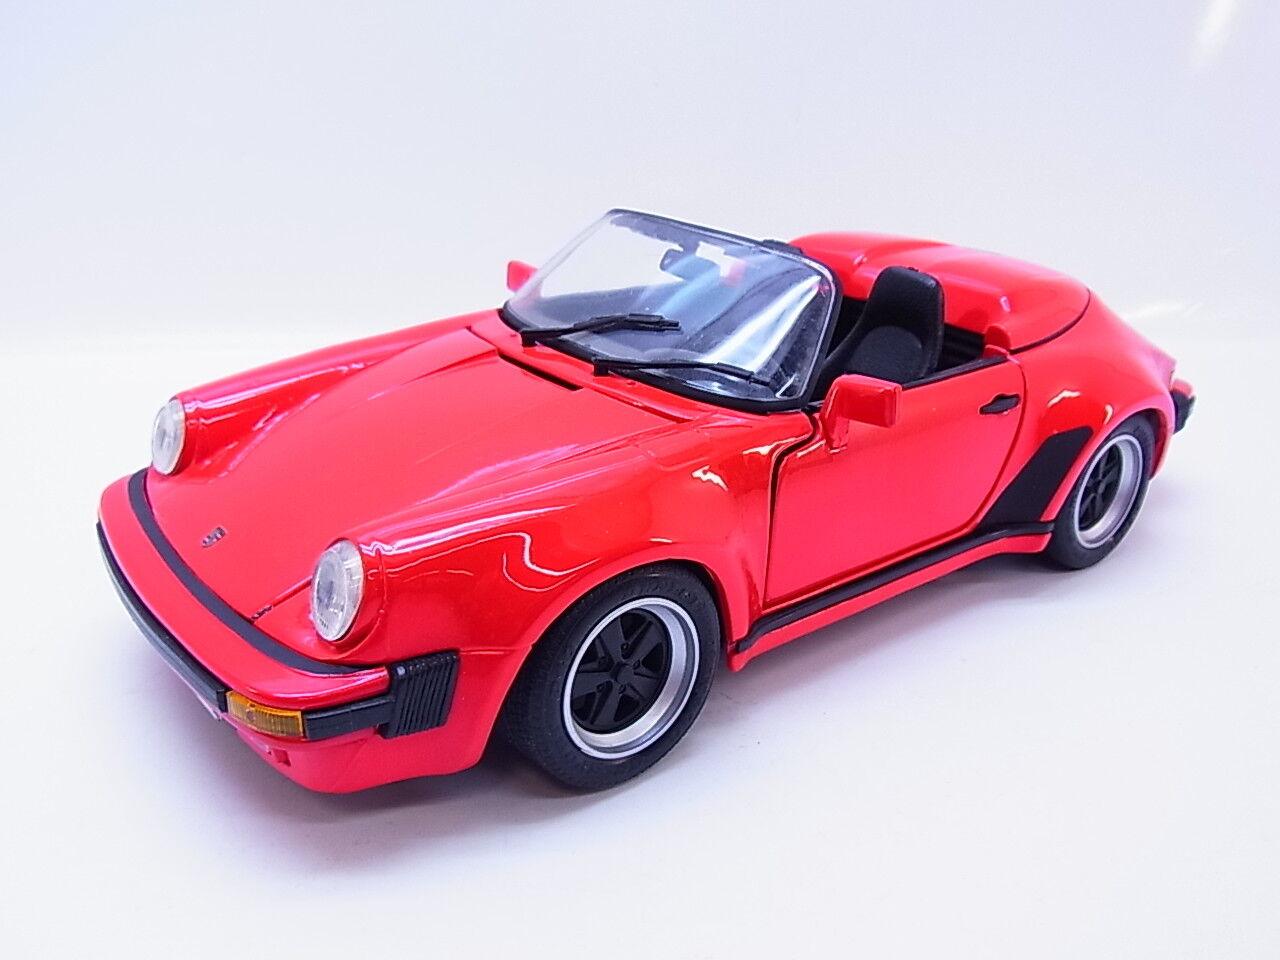 50328 Maisto Porsche 911 G-Modell G-Modell G-Modell Speedster rot Die-Cast-Modellauto 1 18  | Charakteristisch  7c4a83